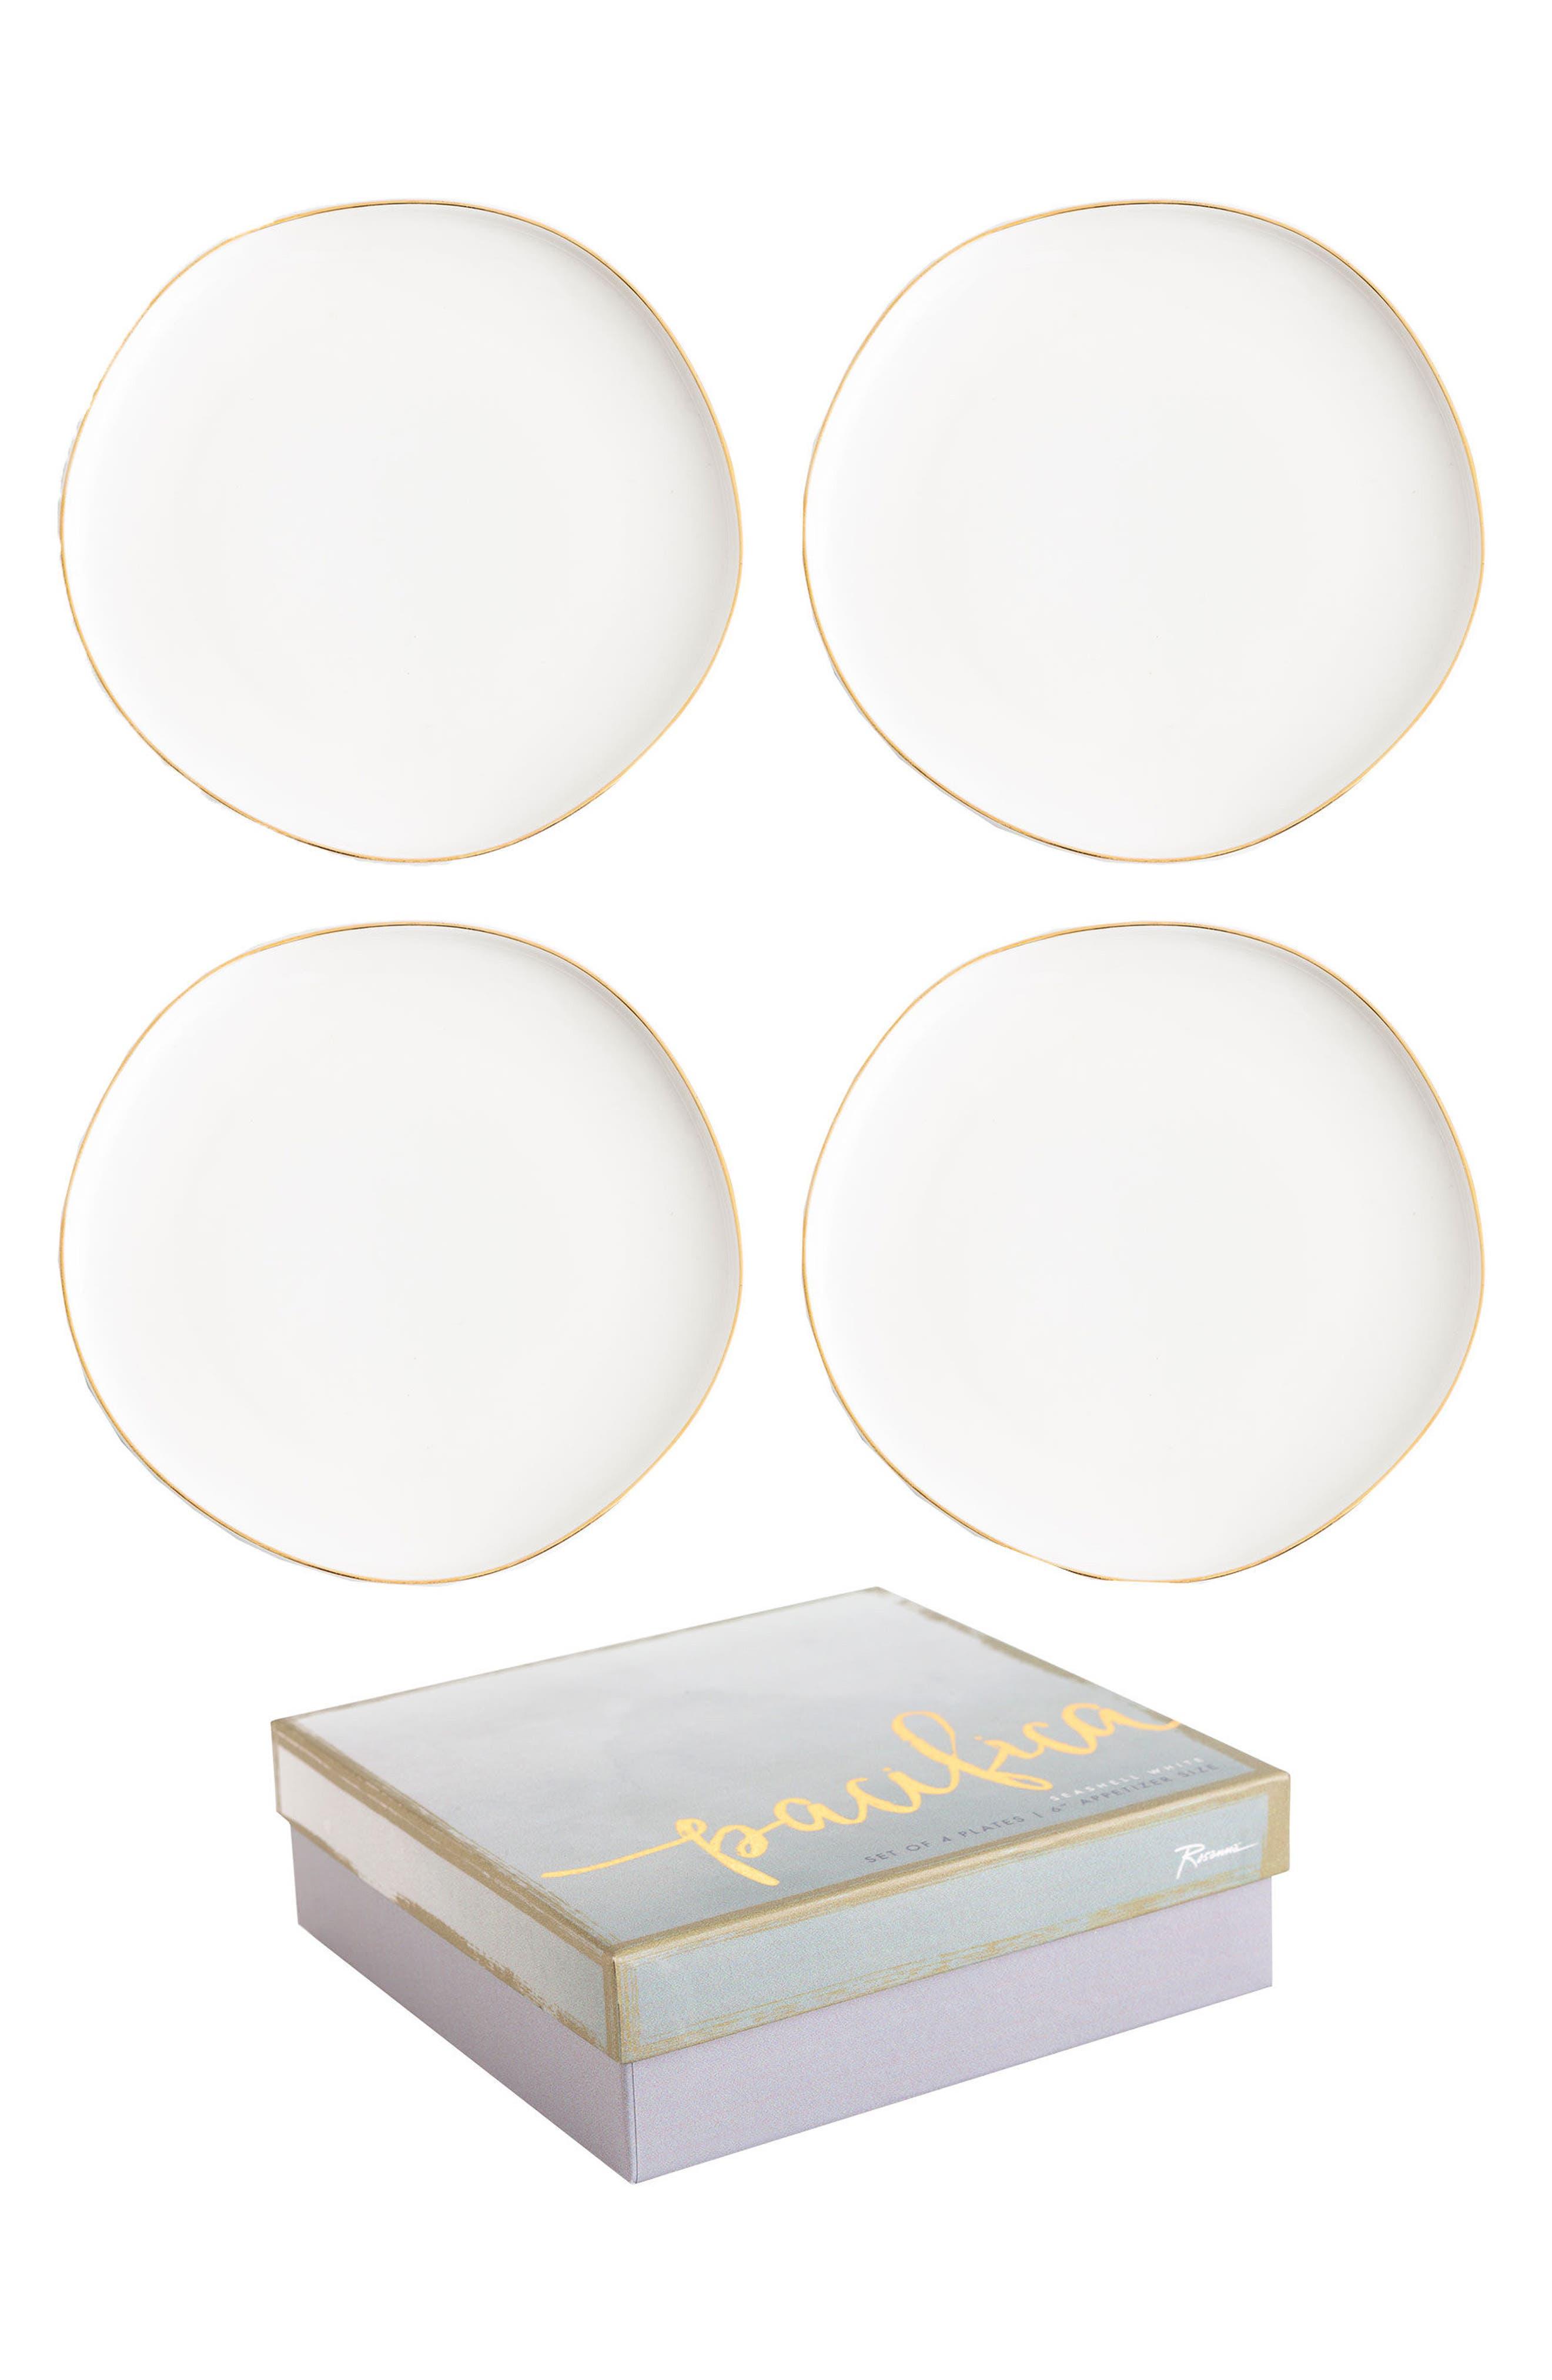 Pacifica Set of 4 Plates,                             Main thumbnail 1, color,                             100